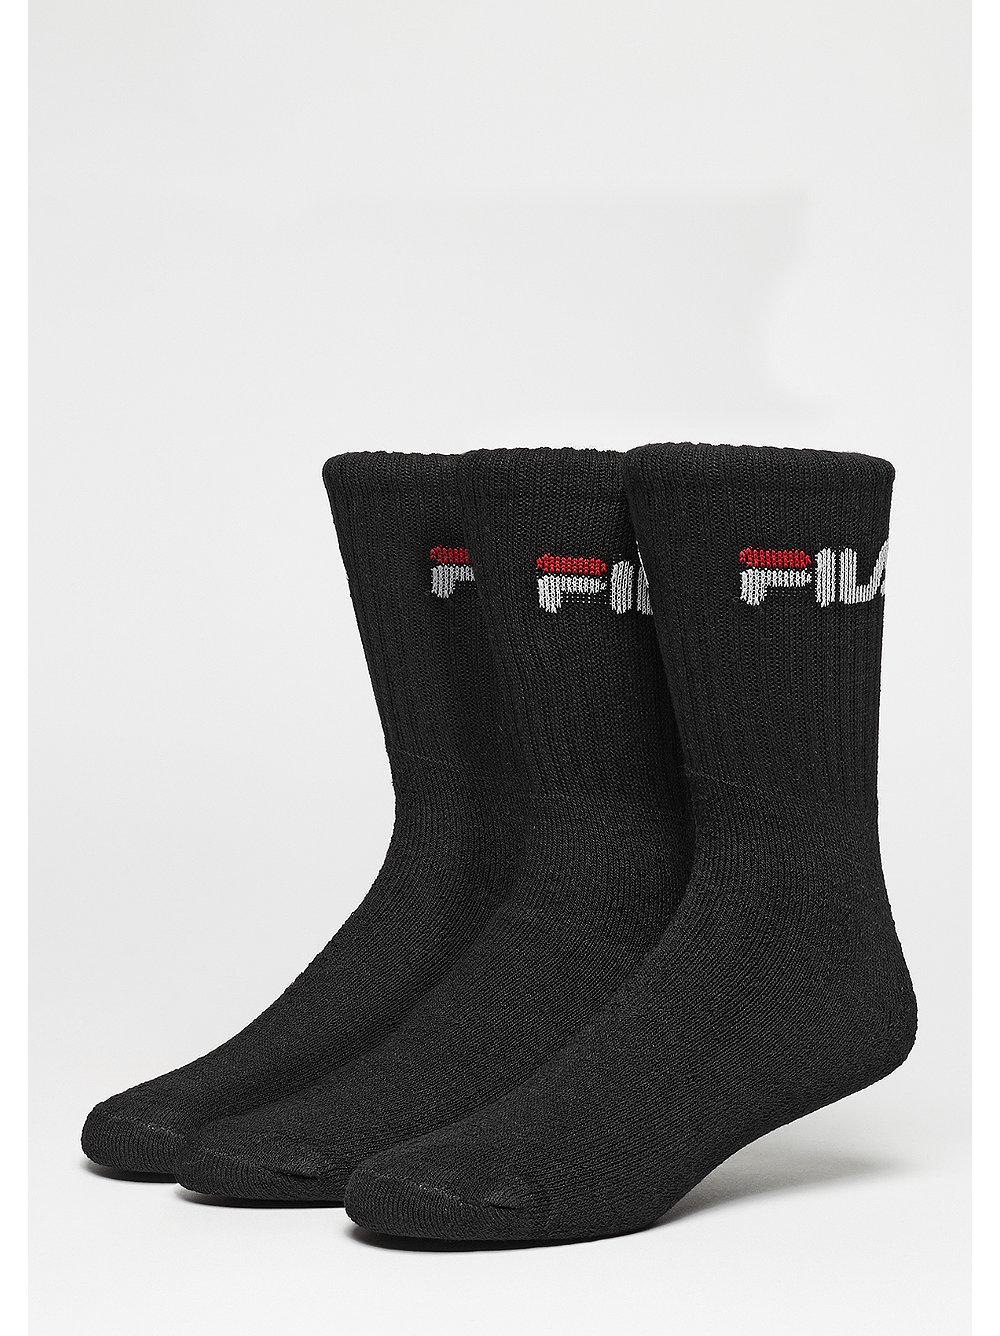 Fila Fila Men Sport Socks 3pack F9505 Black